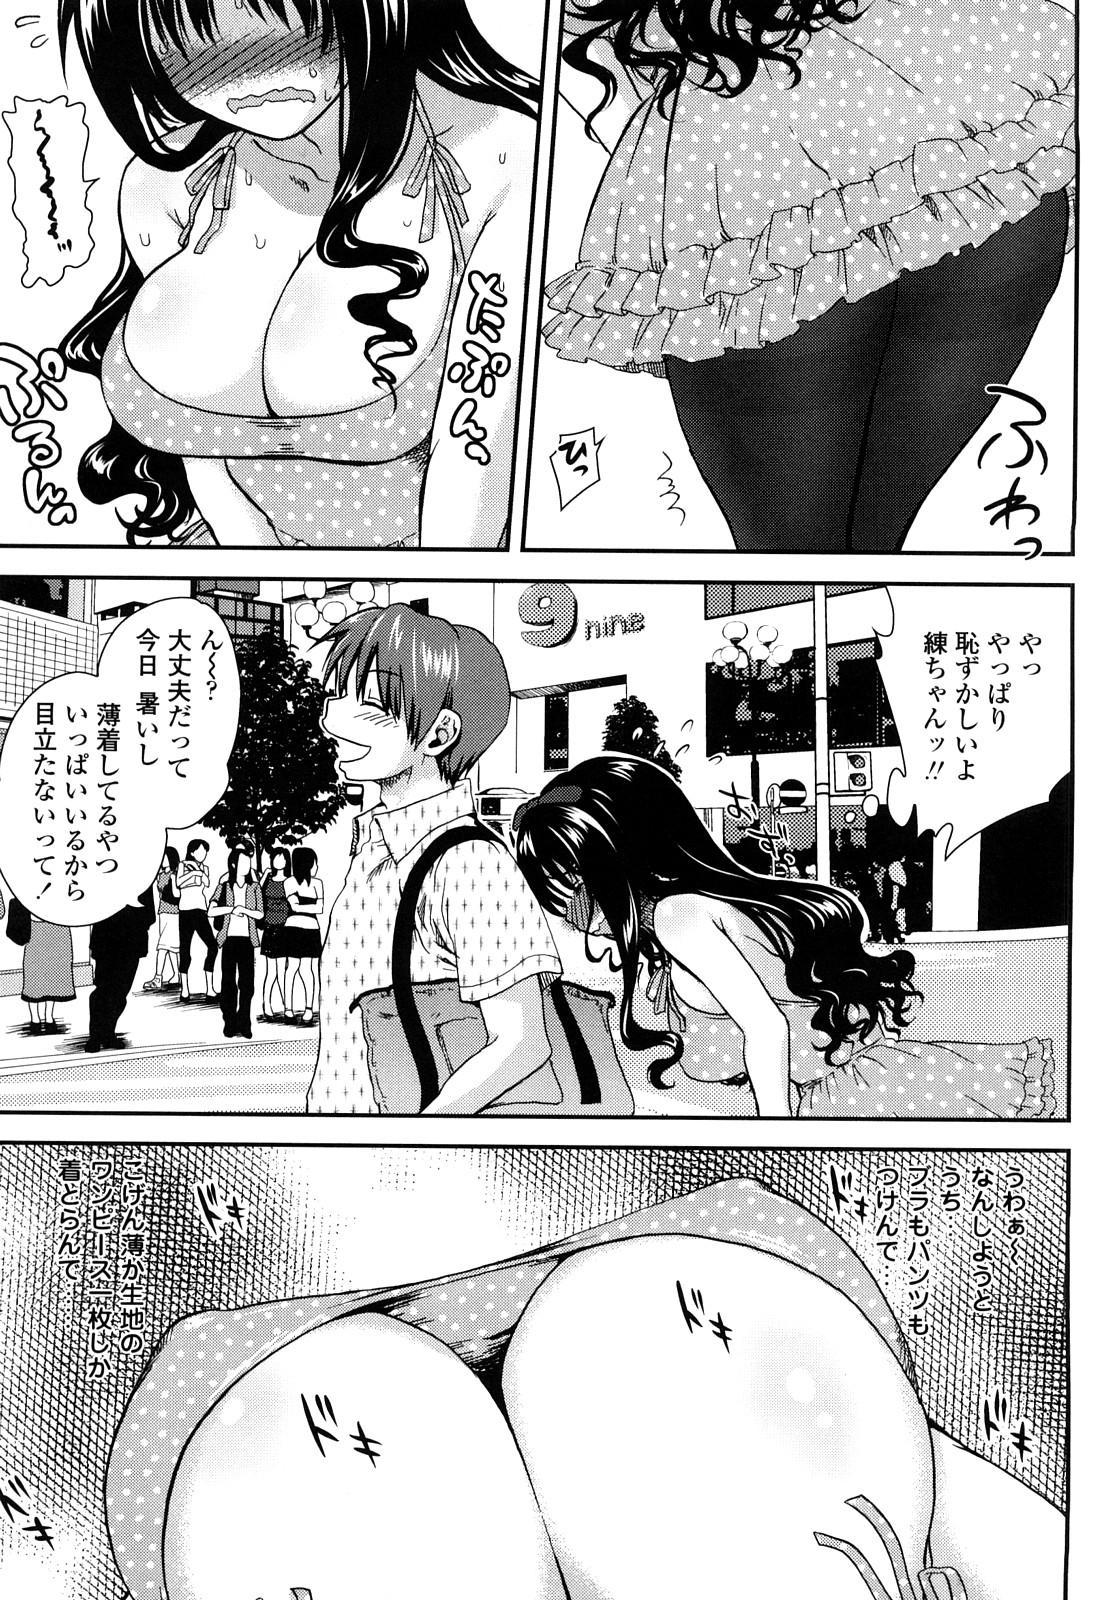 Ichigo Marble 71